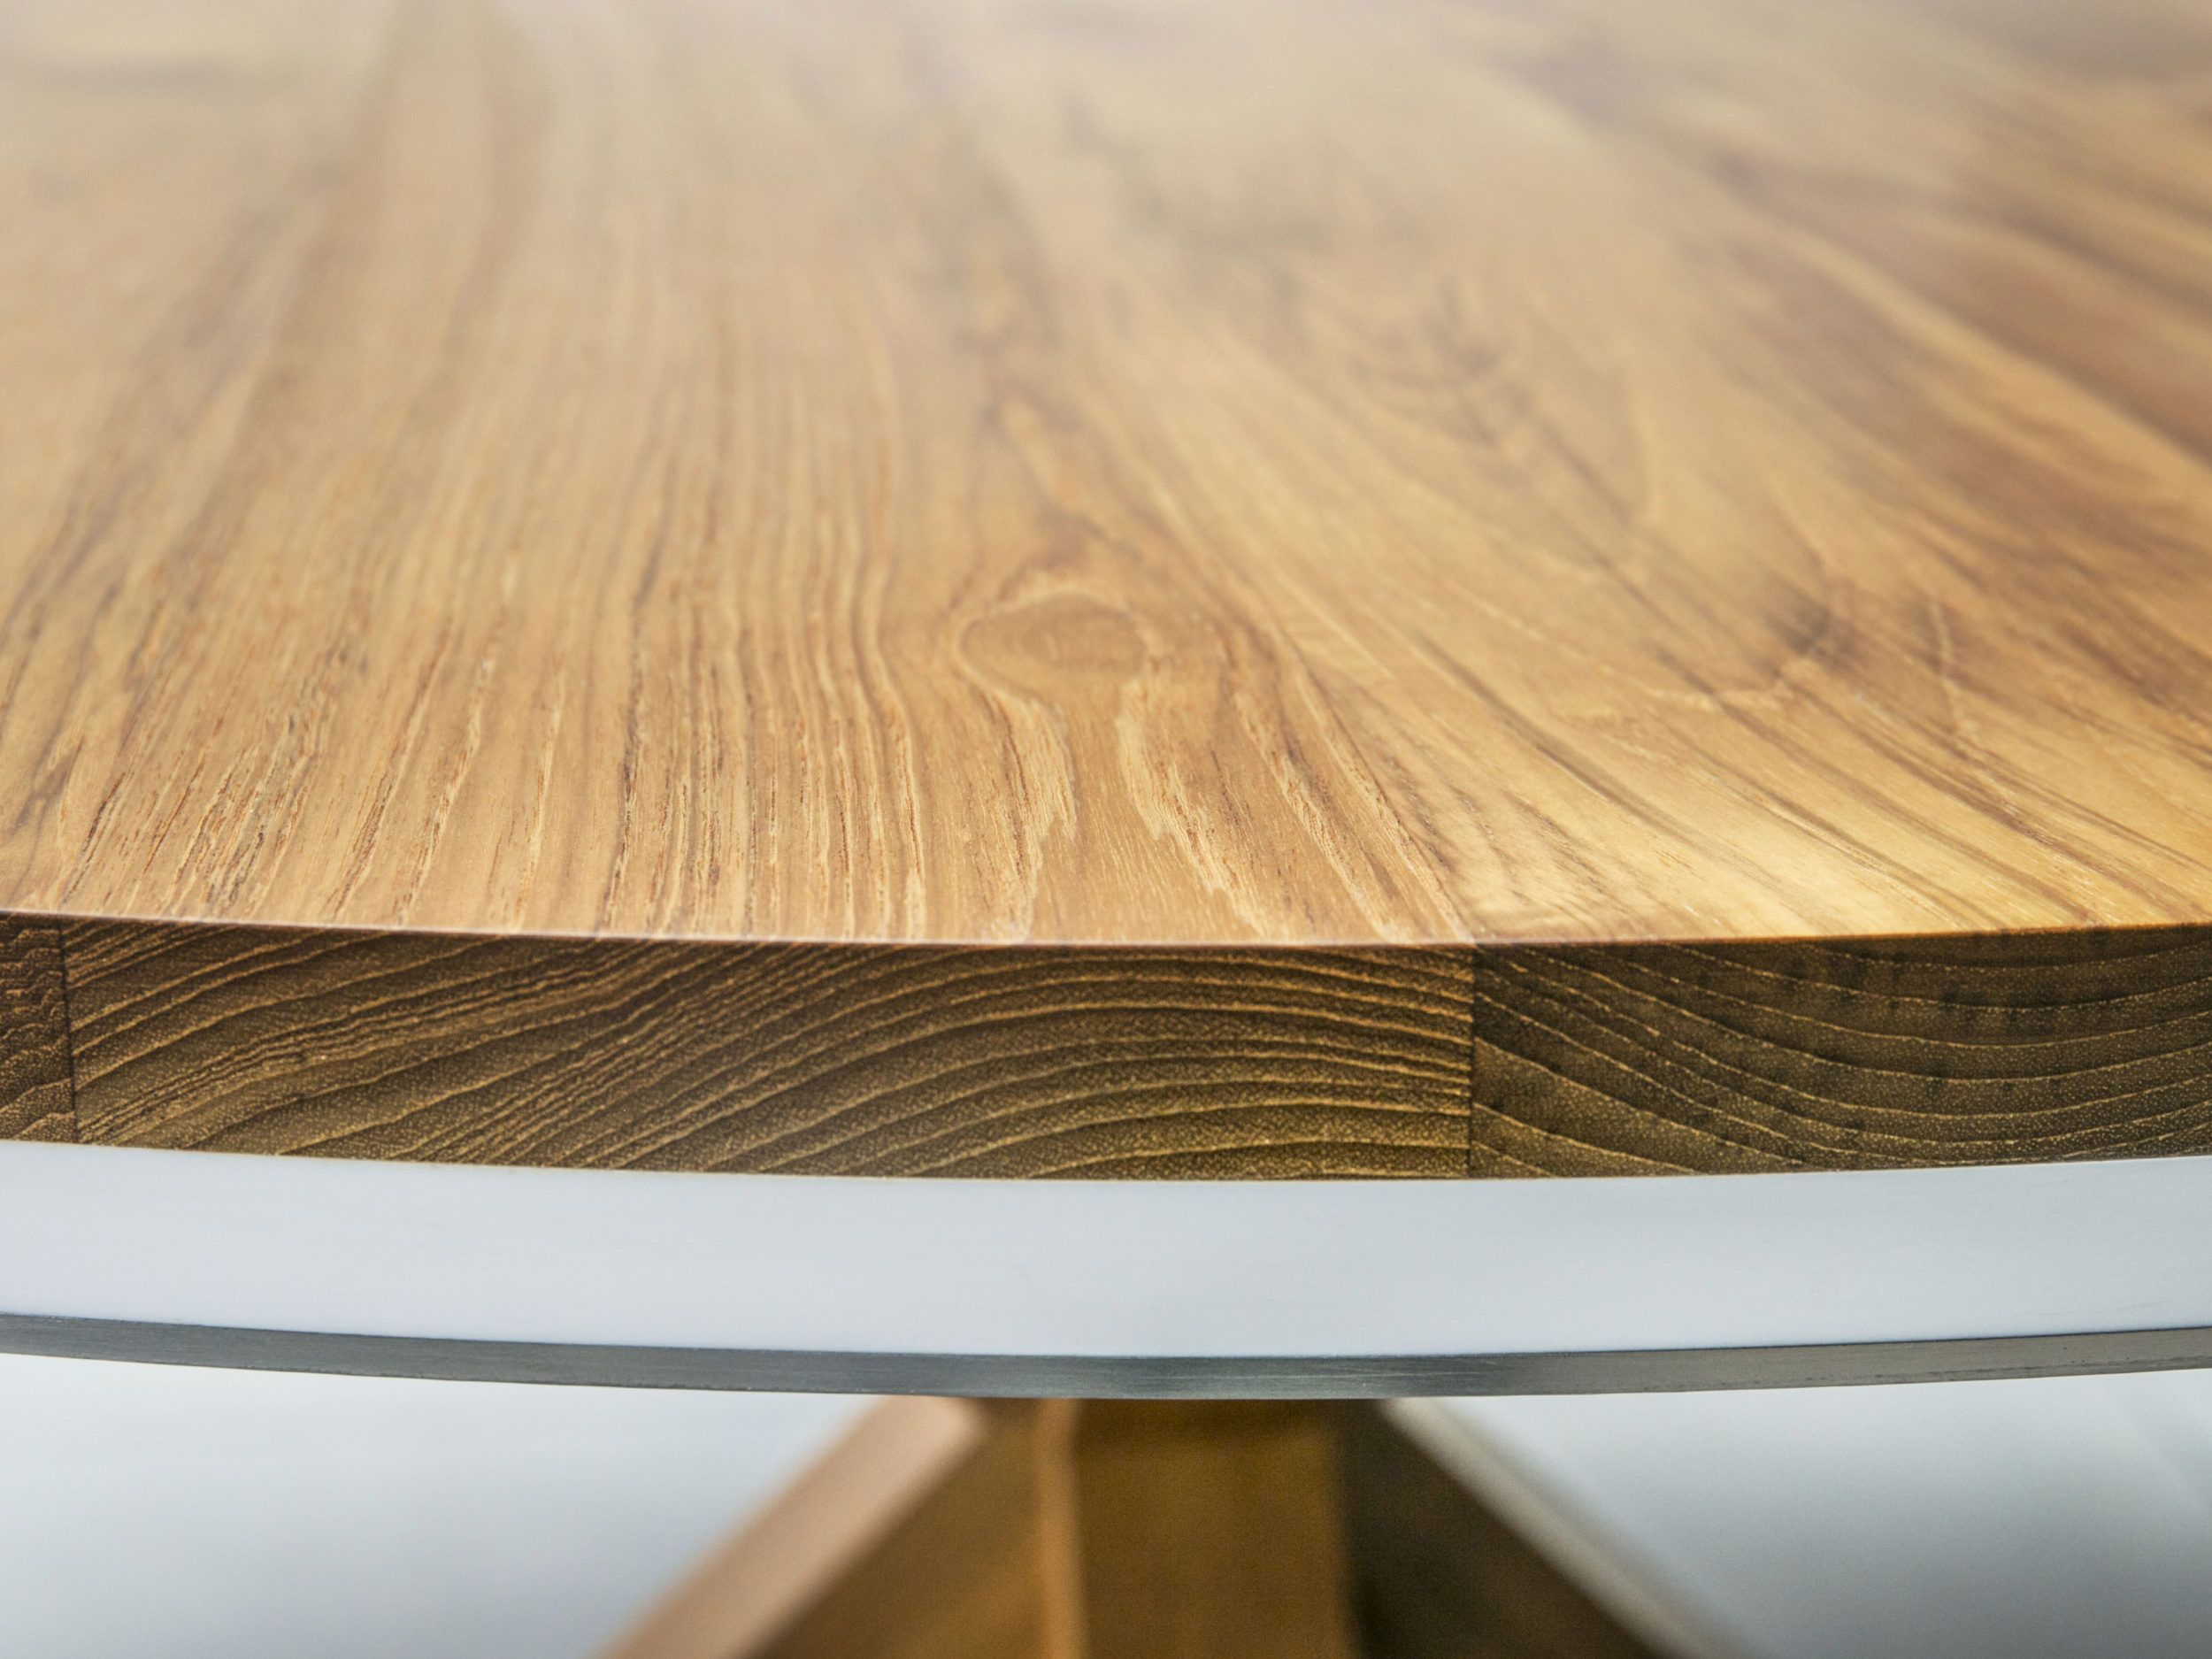 X Table St James Interiors Round Dining Table Teak Worktop